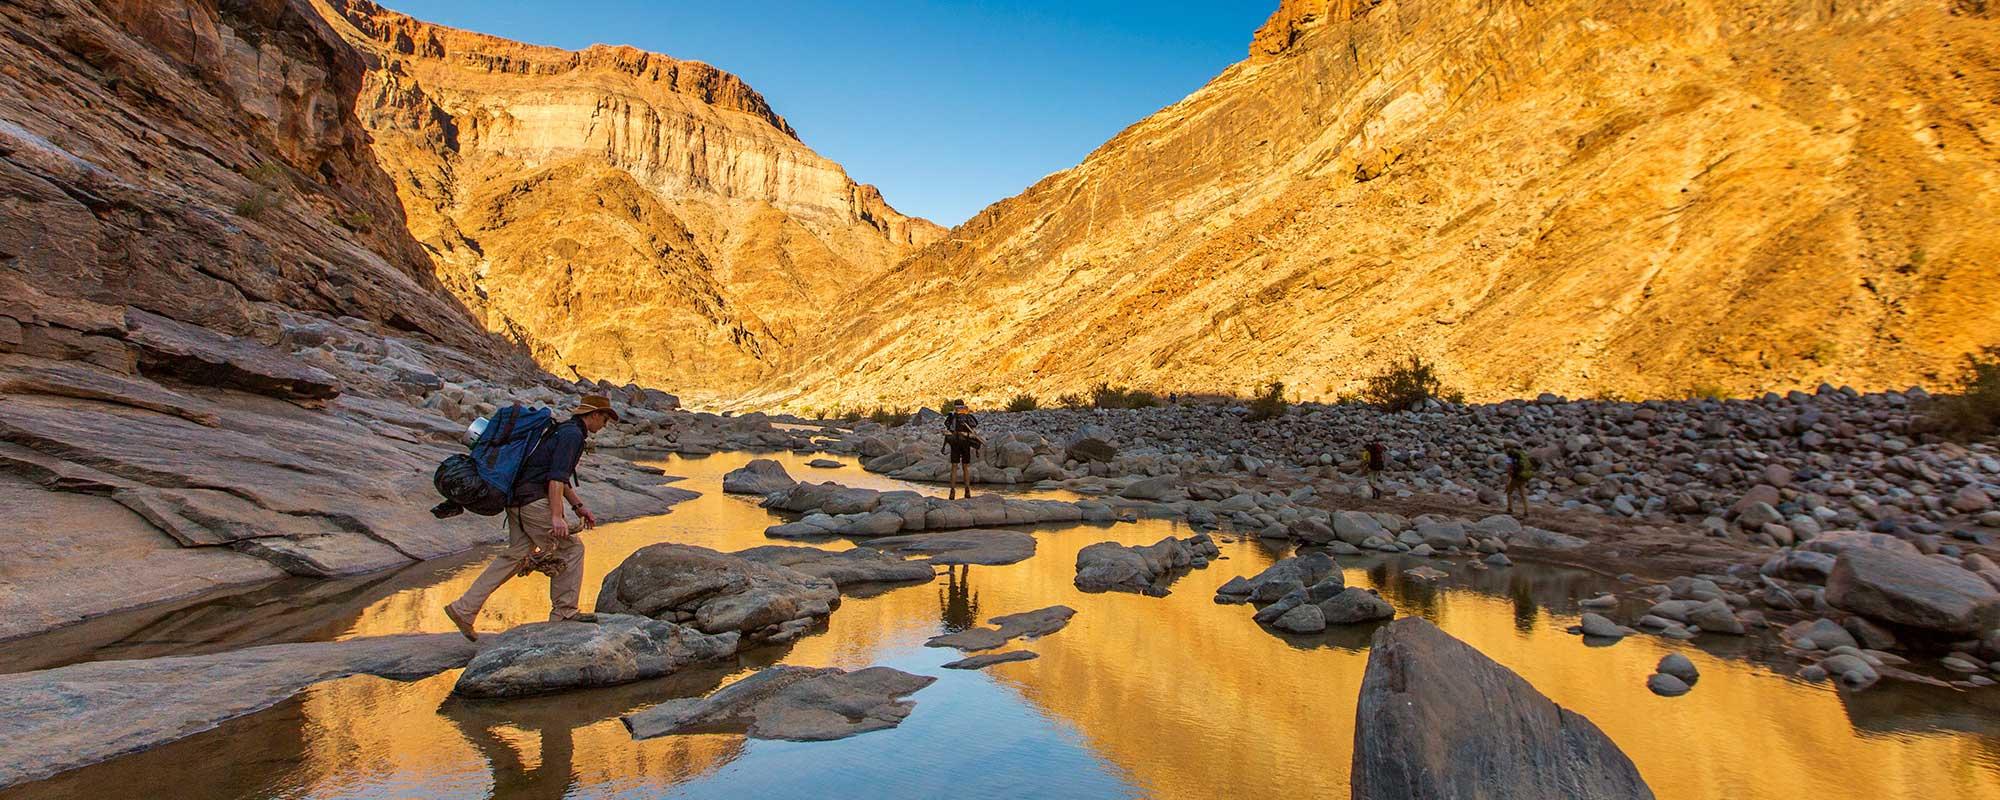 fish river canyon namibia adventure